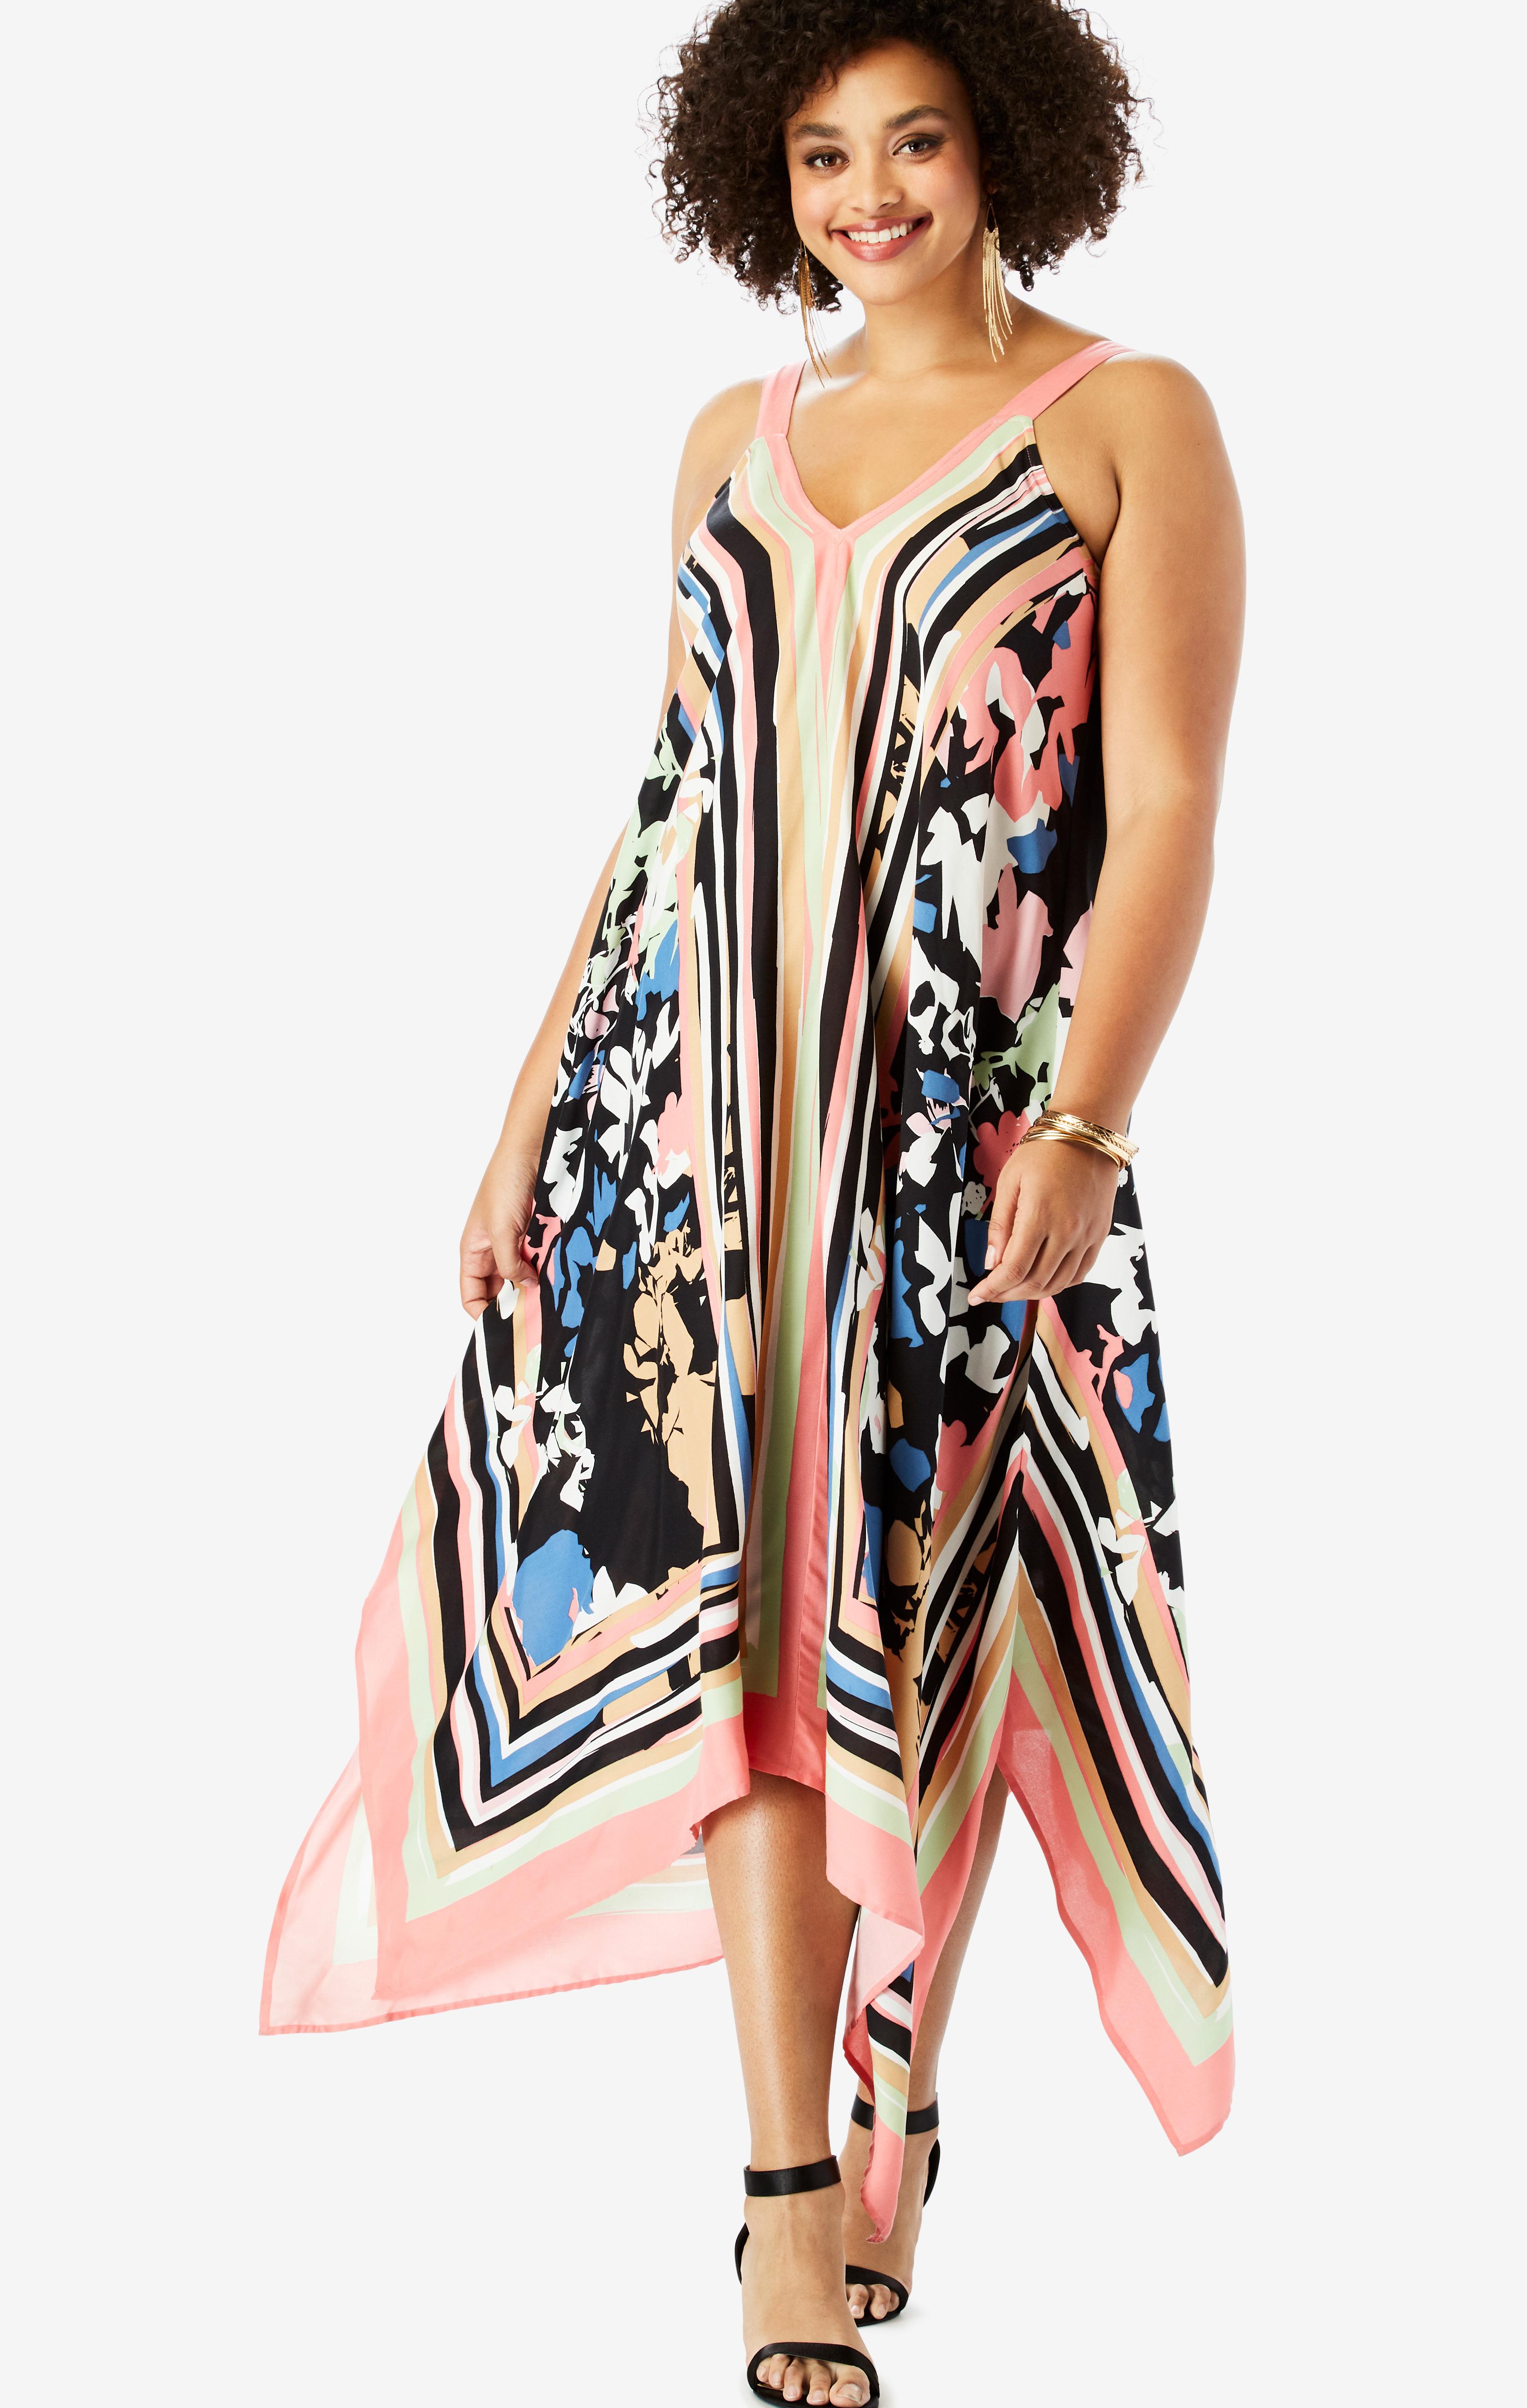 b3353a3a393 Scarf-Print Maxi Dress with Handkerchief Hem